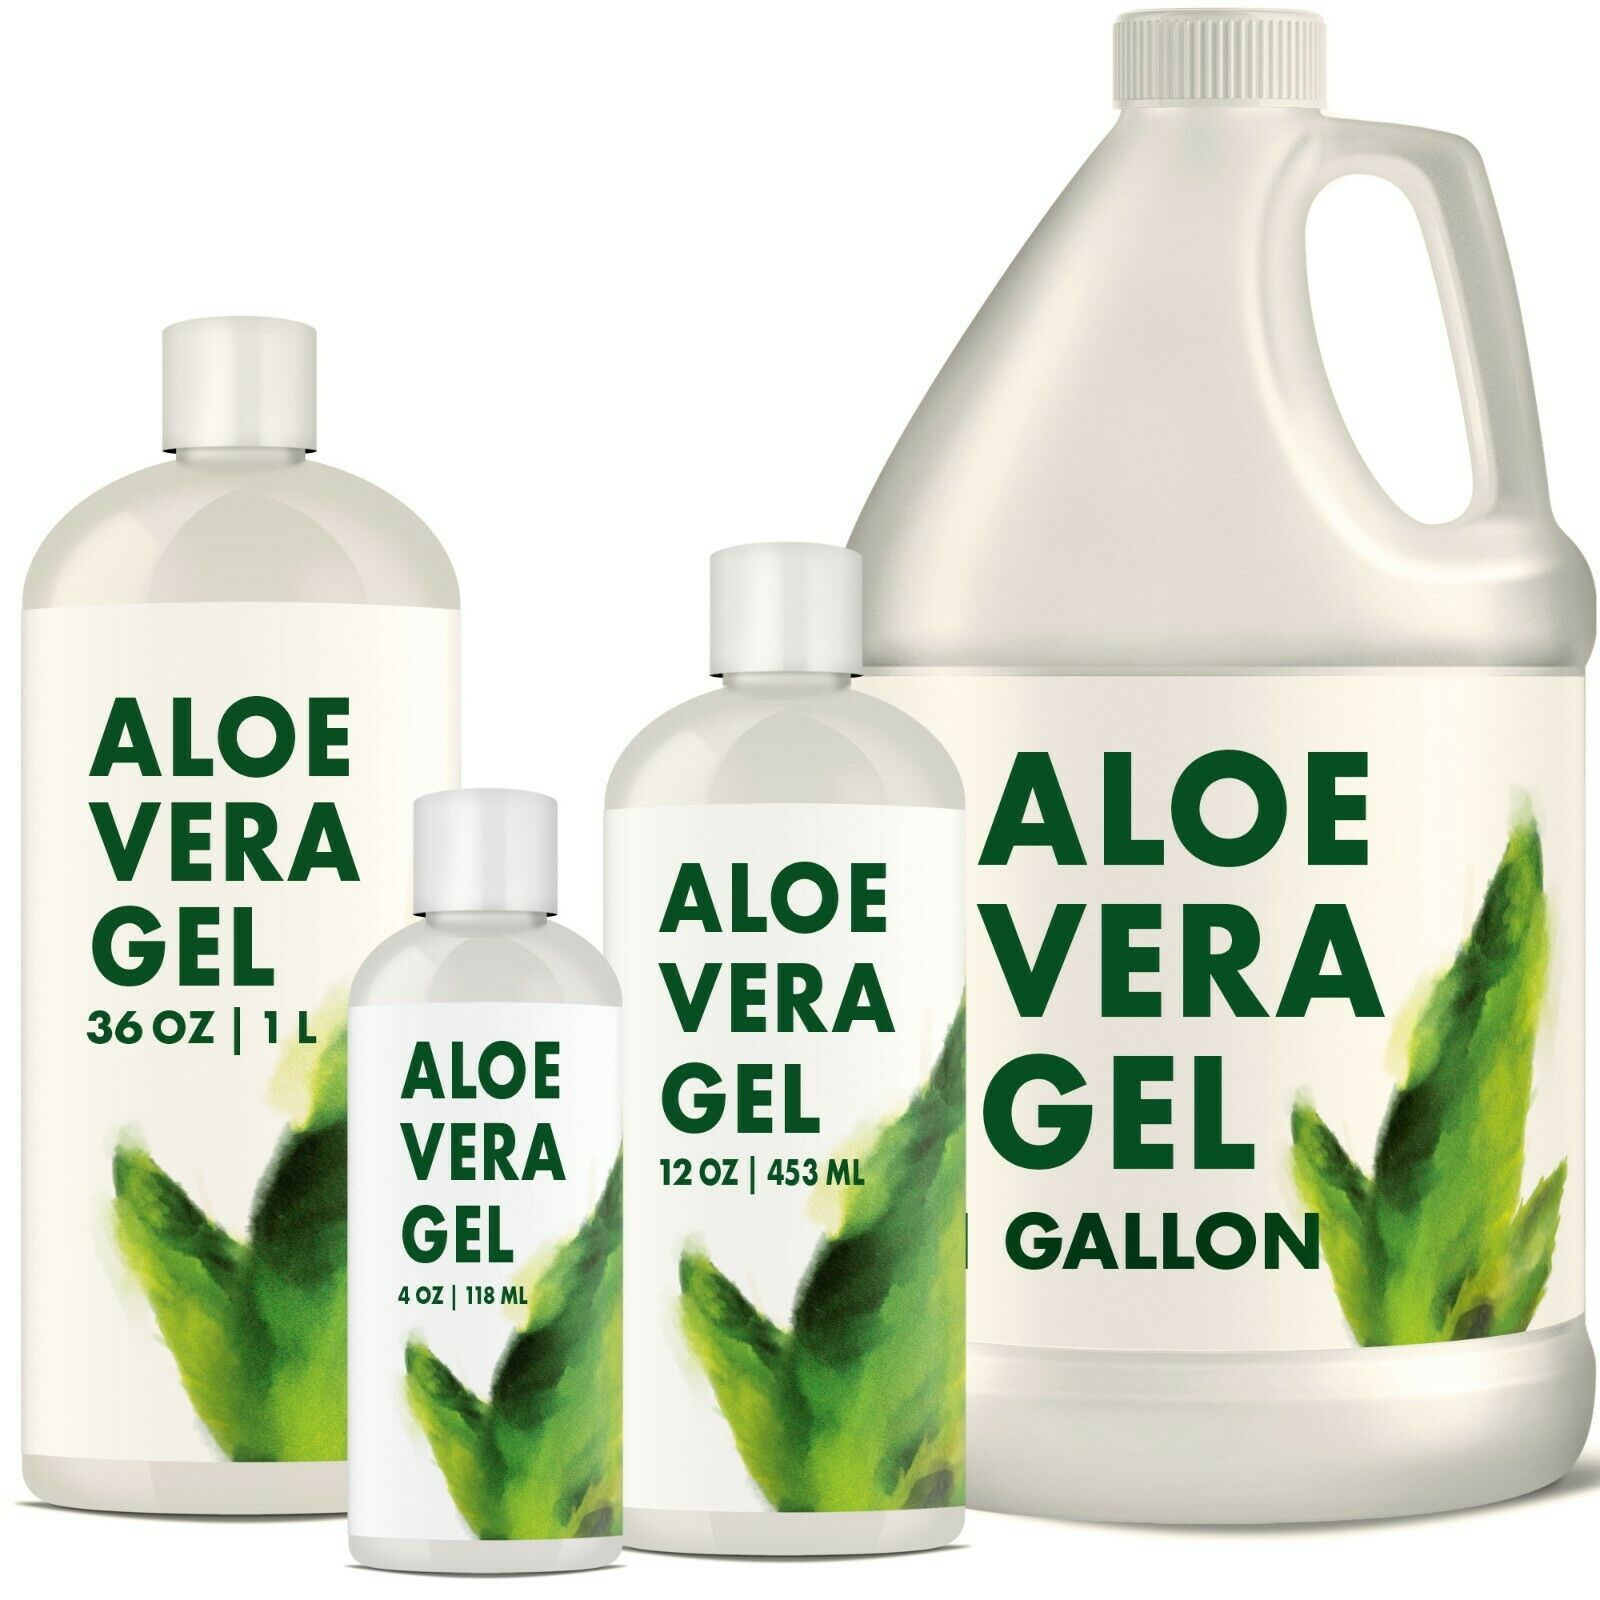 Aloe Vera Gel For Face & Body Moisturizer Variations 12 oz t